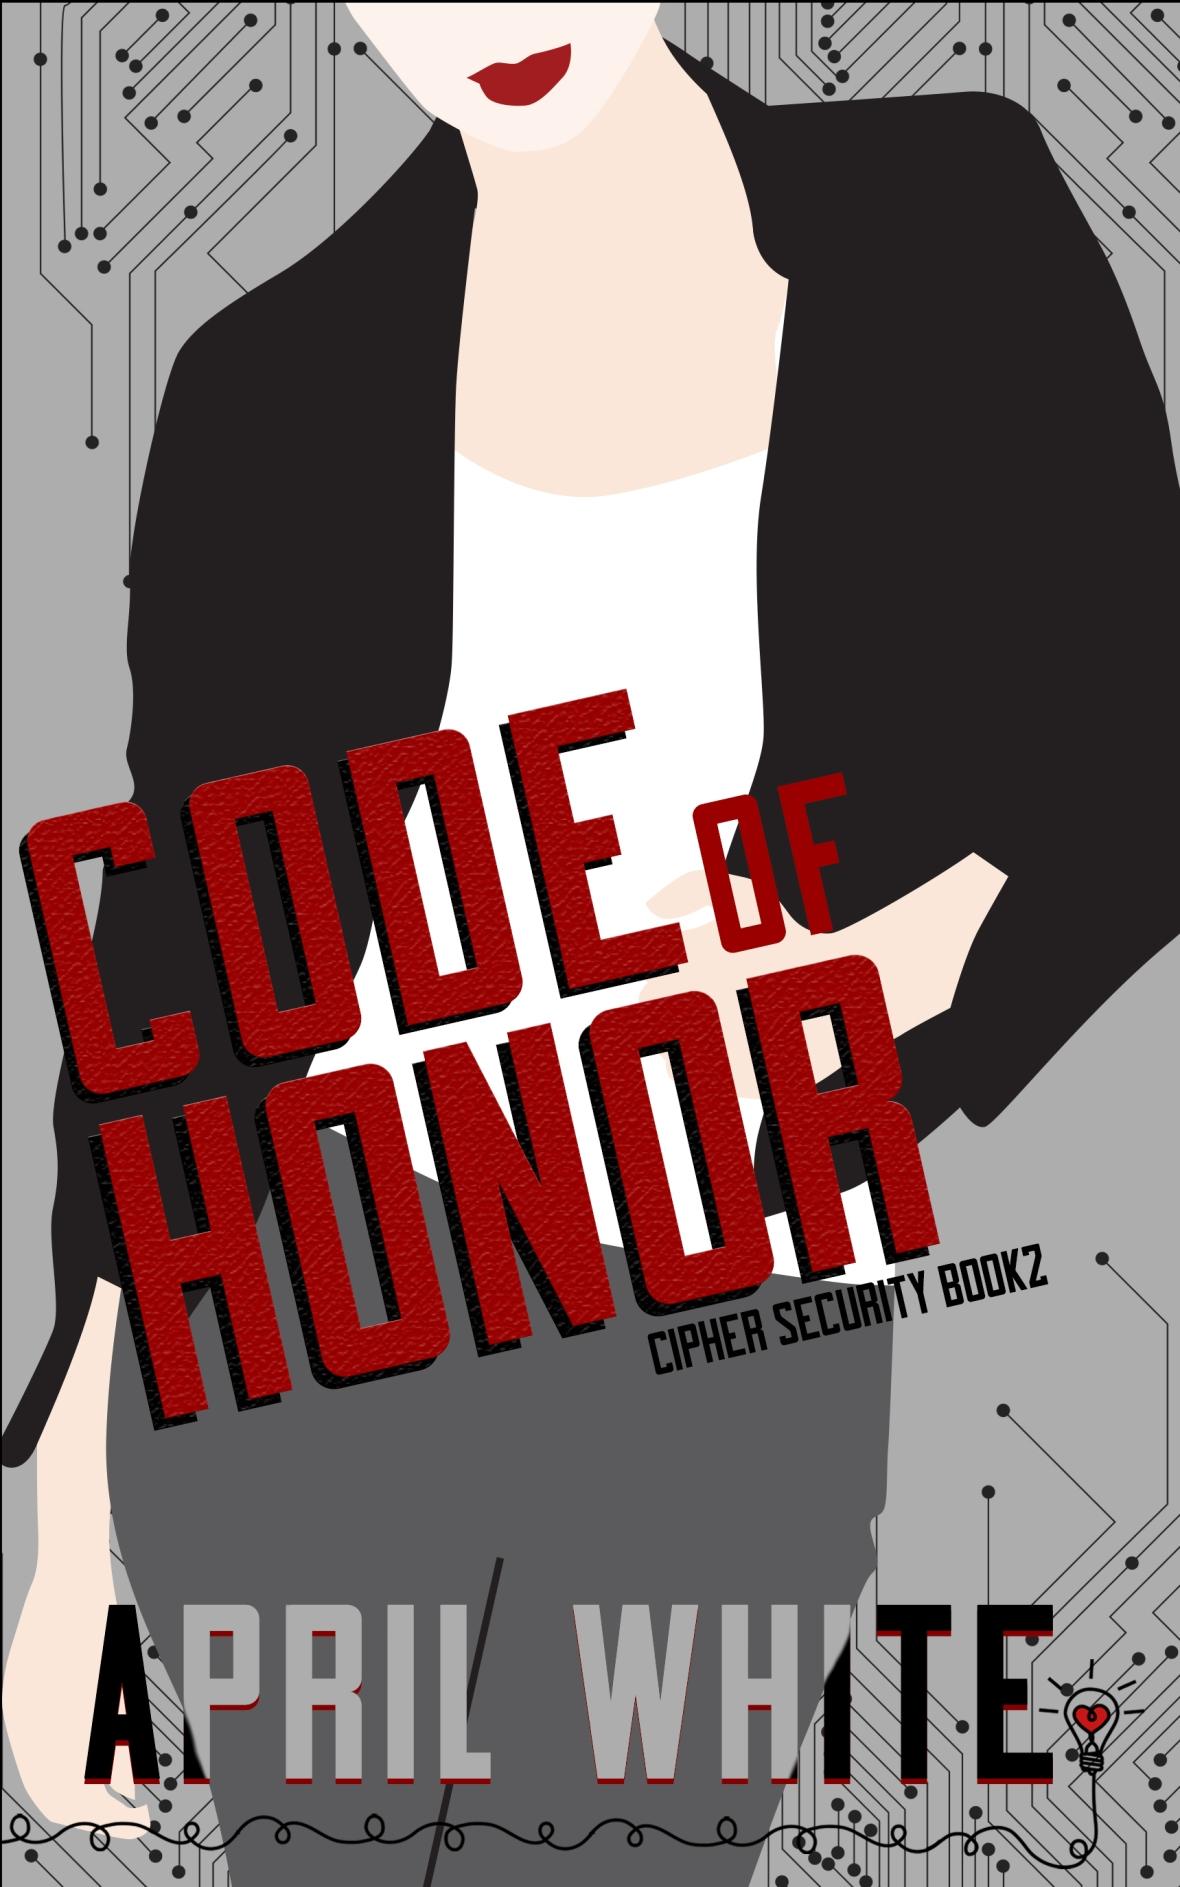 cs-code-of-honor copy